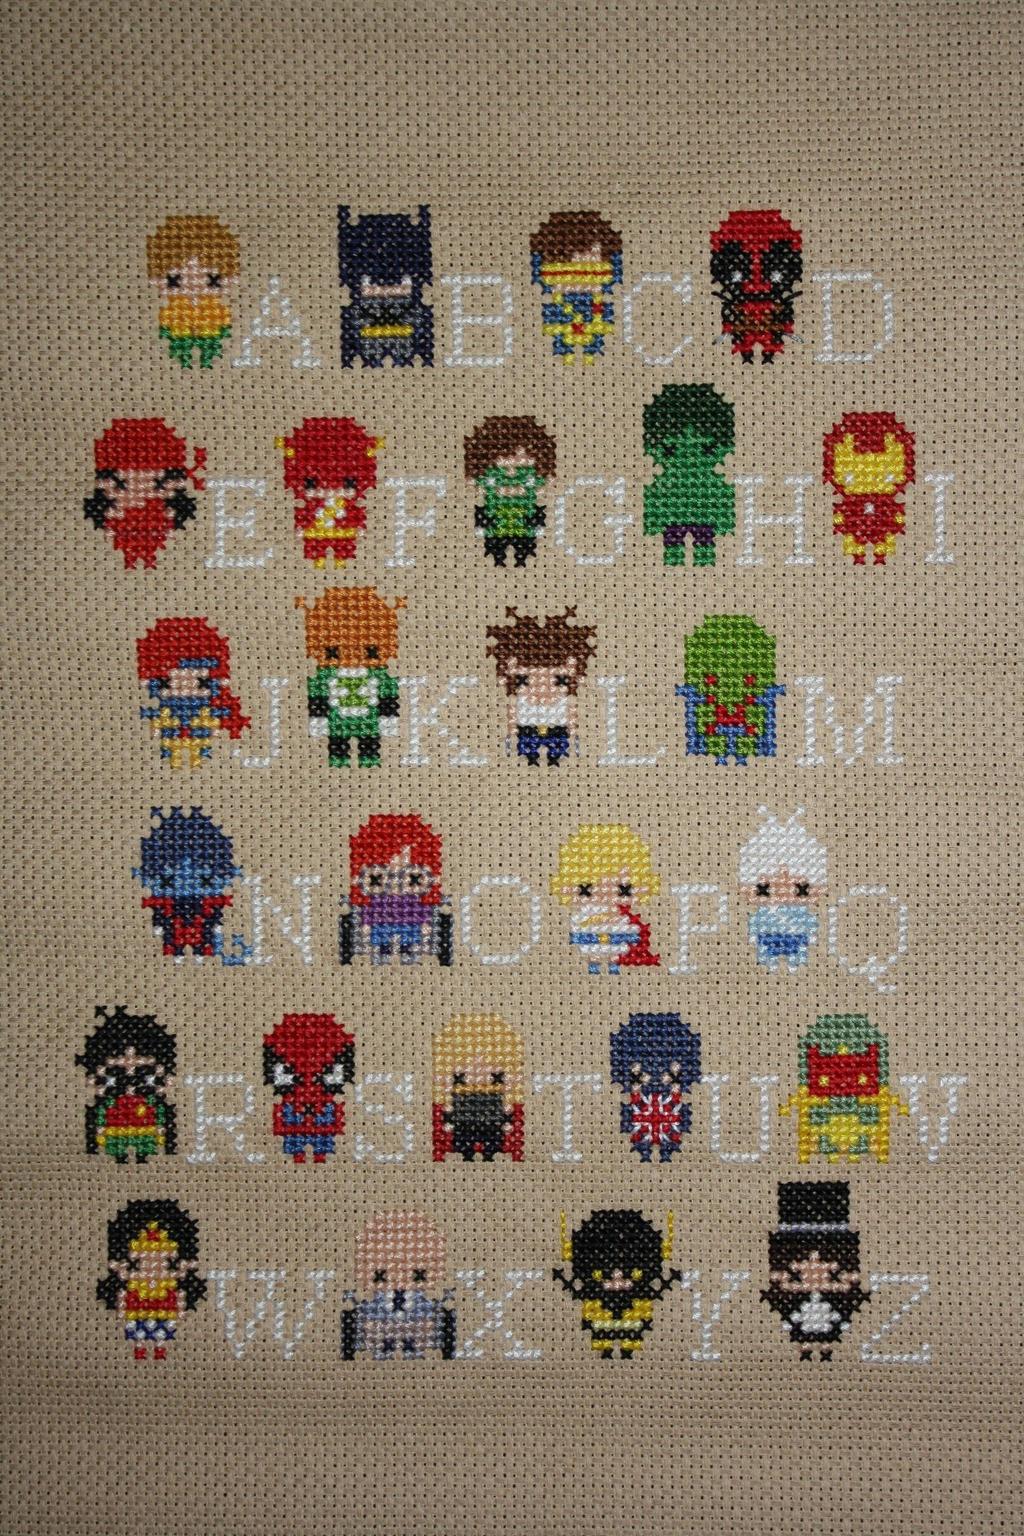 Superhero Alphabet Sampler COMPLETED